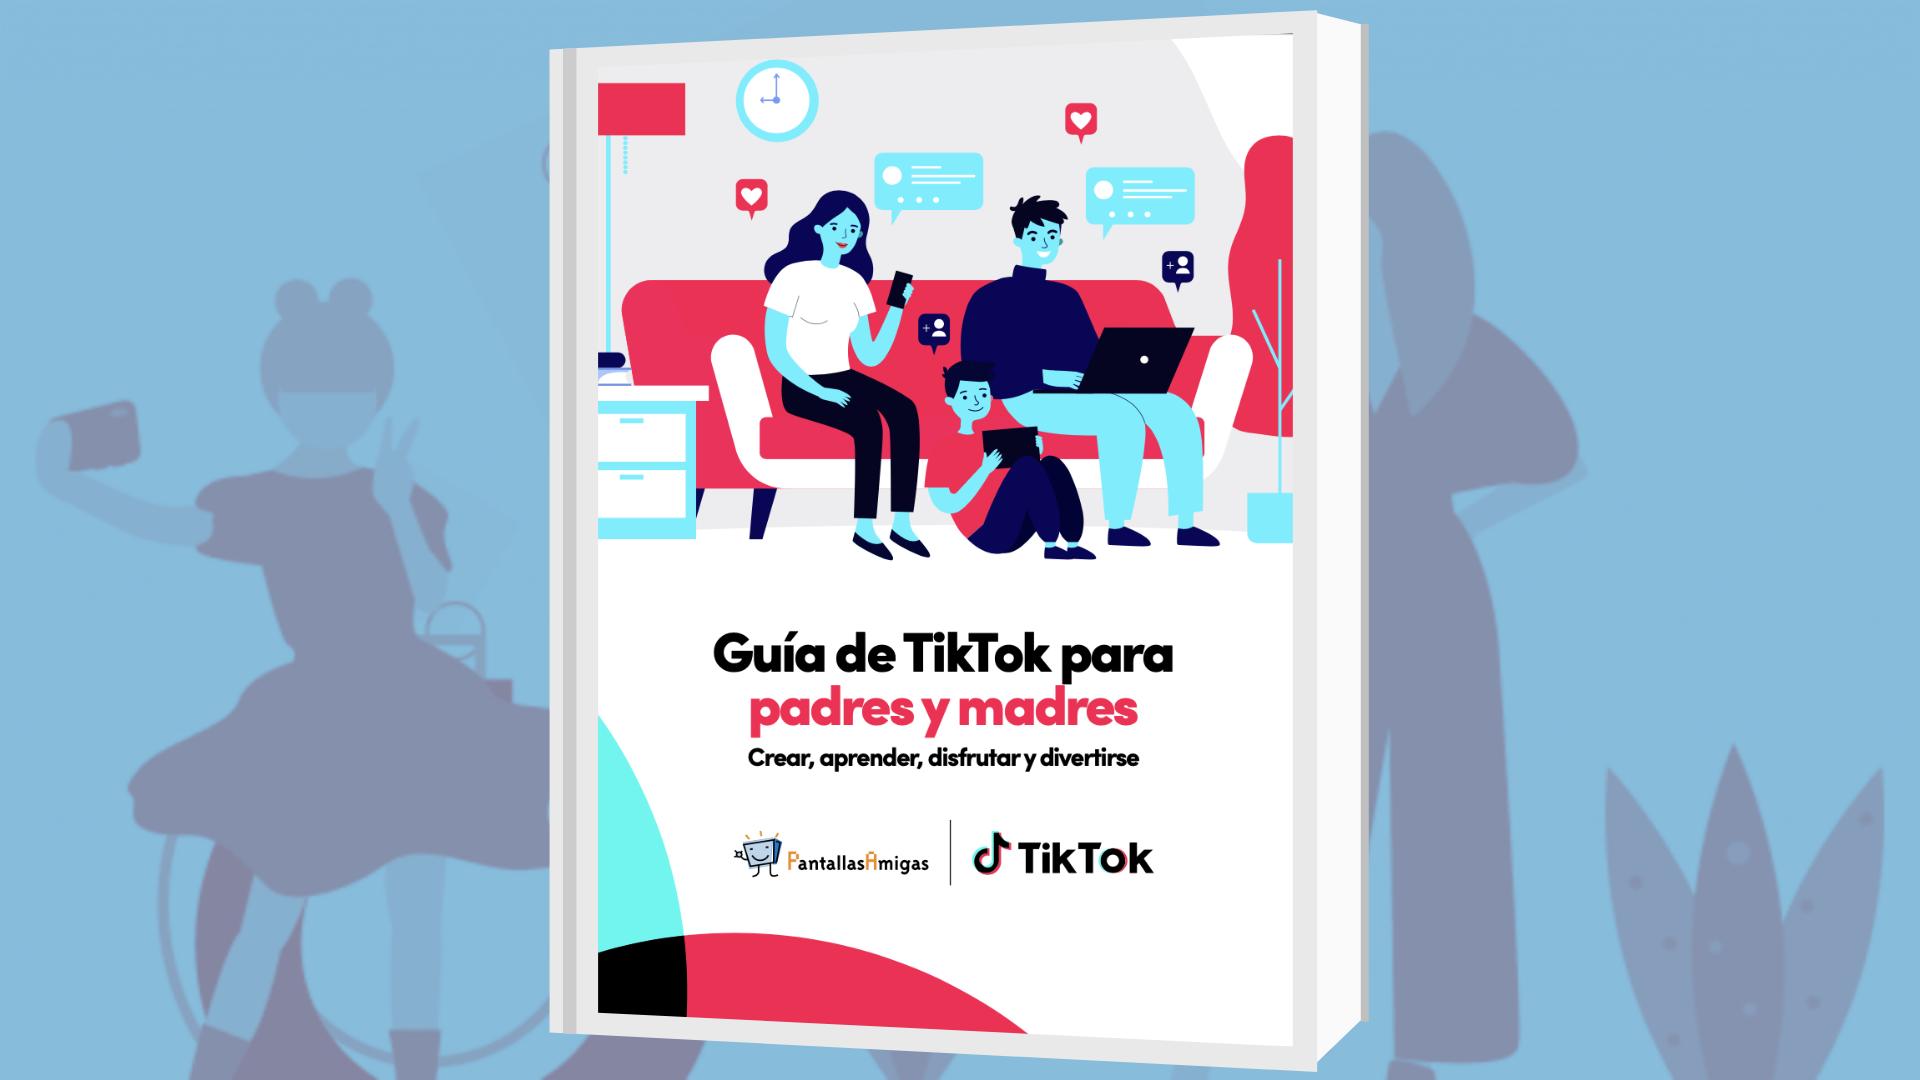 Guía de TikTok PantallasAmigas